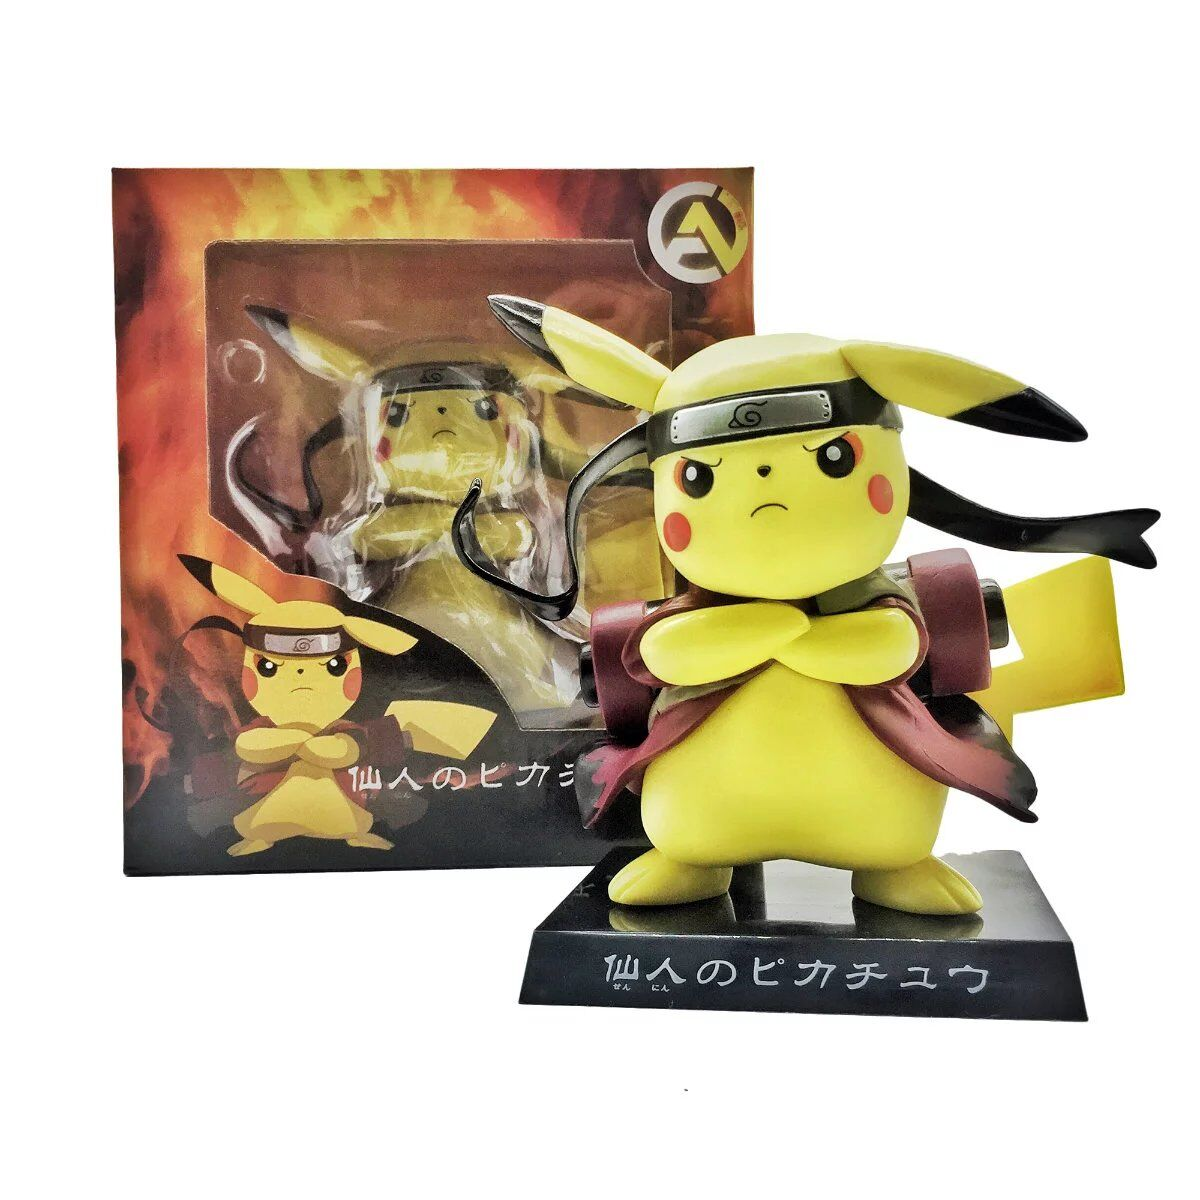 Anime Cartoon Pikachu Cos Uzumaki Naruto PVC Figure Collectible Model Toy 13cm<br><br>Aliexpress